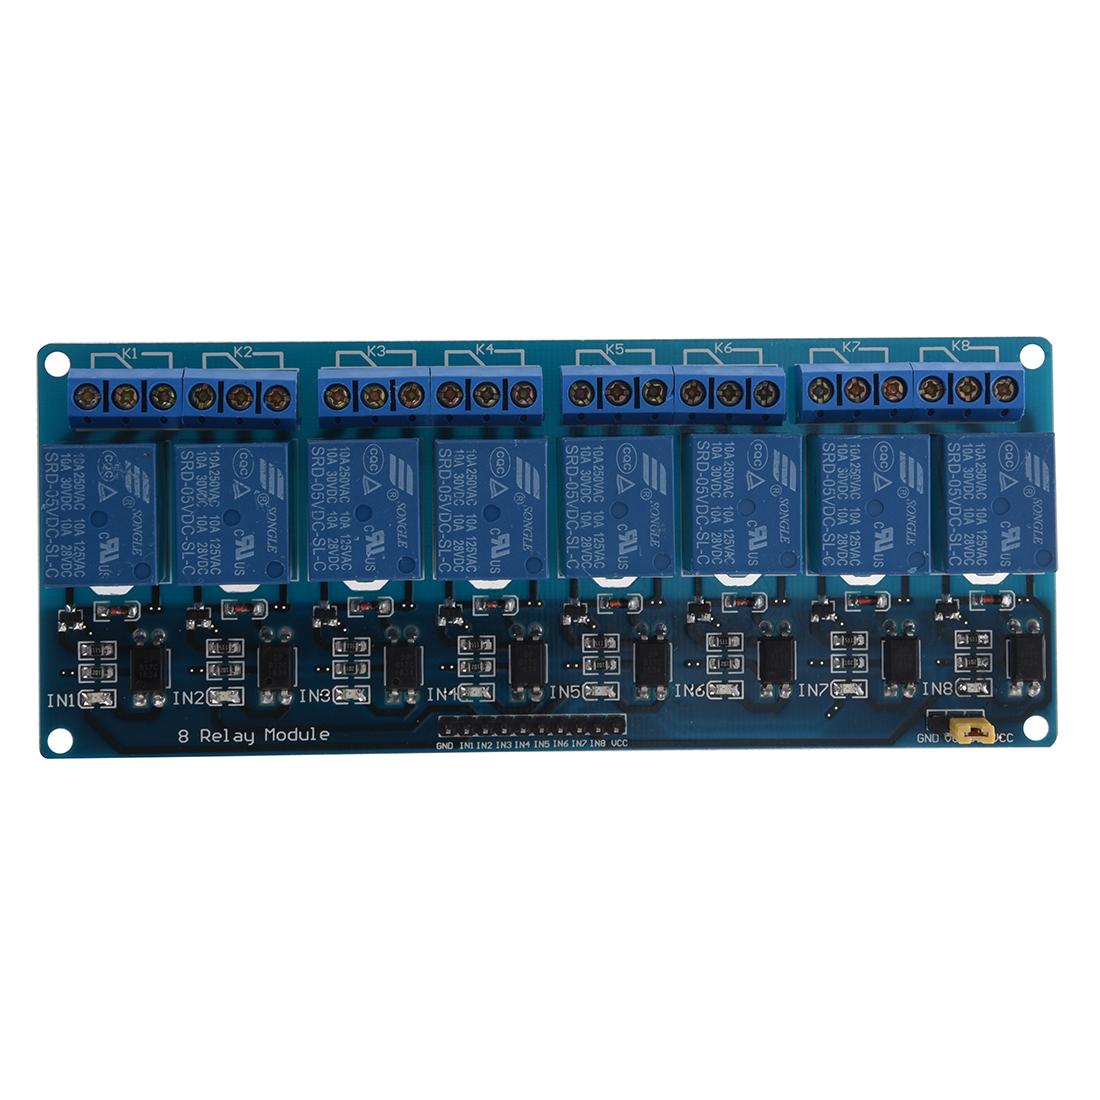 V channel relay module board for arduino pic avr mcu